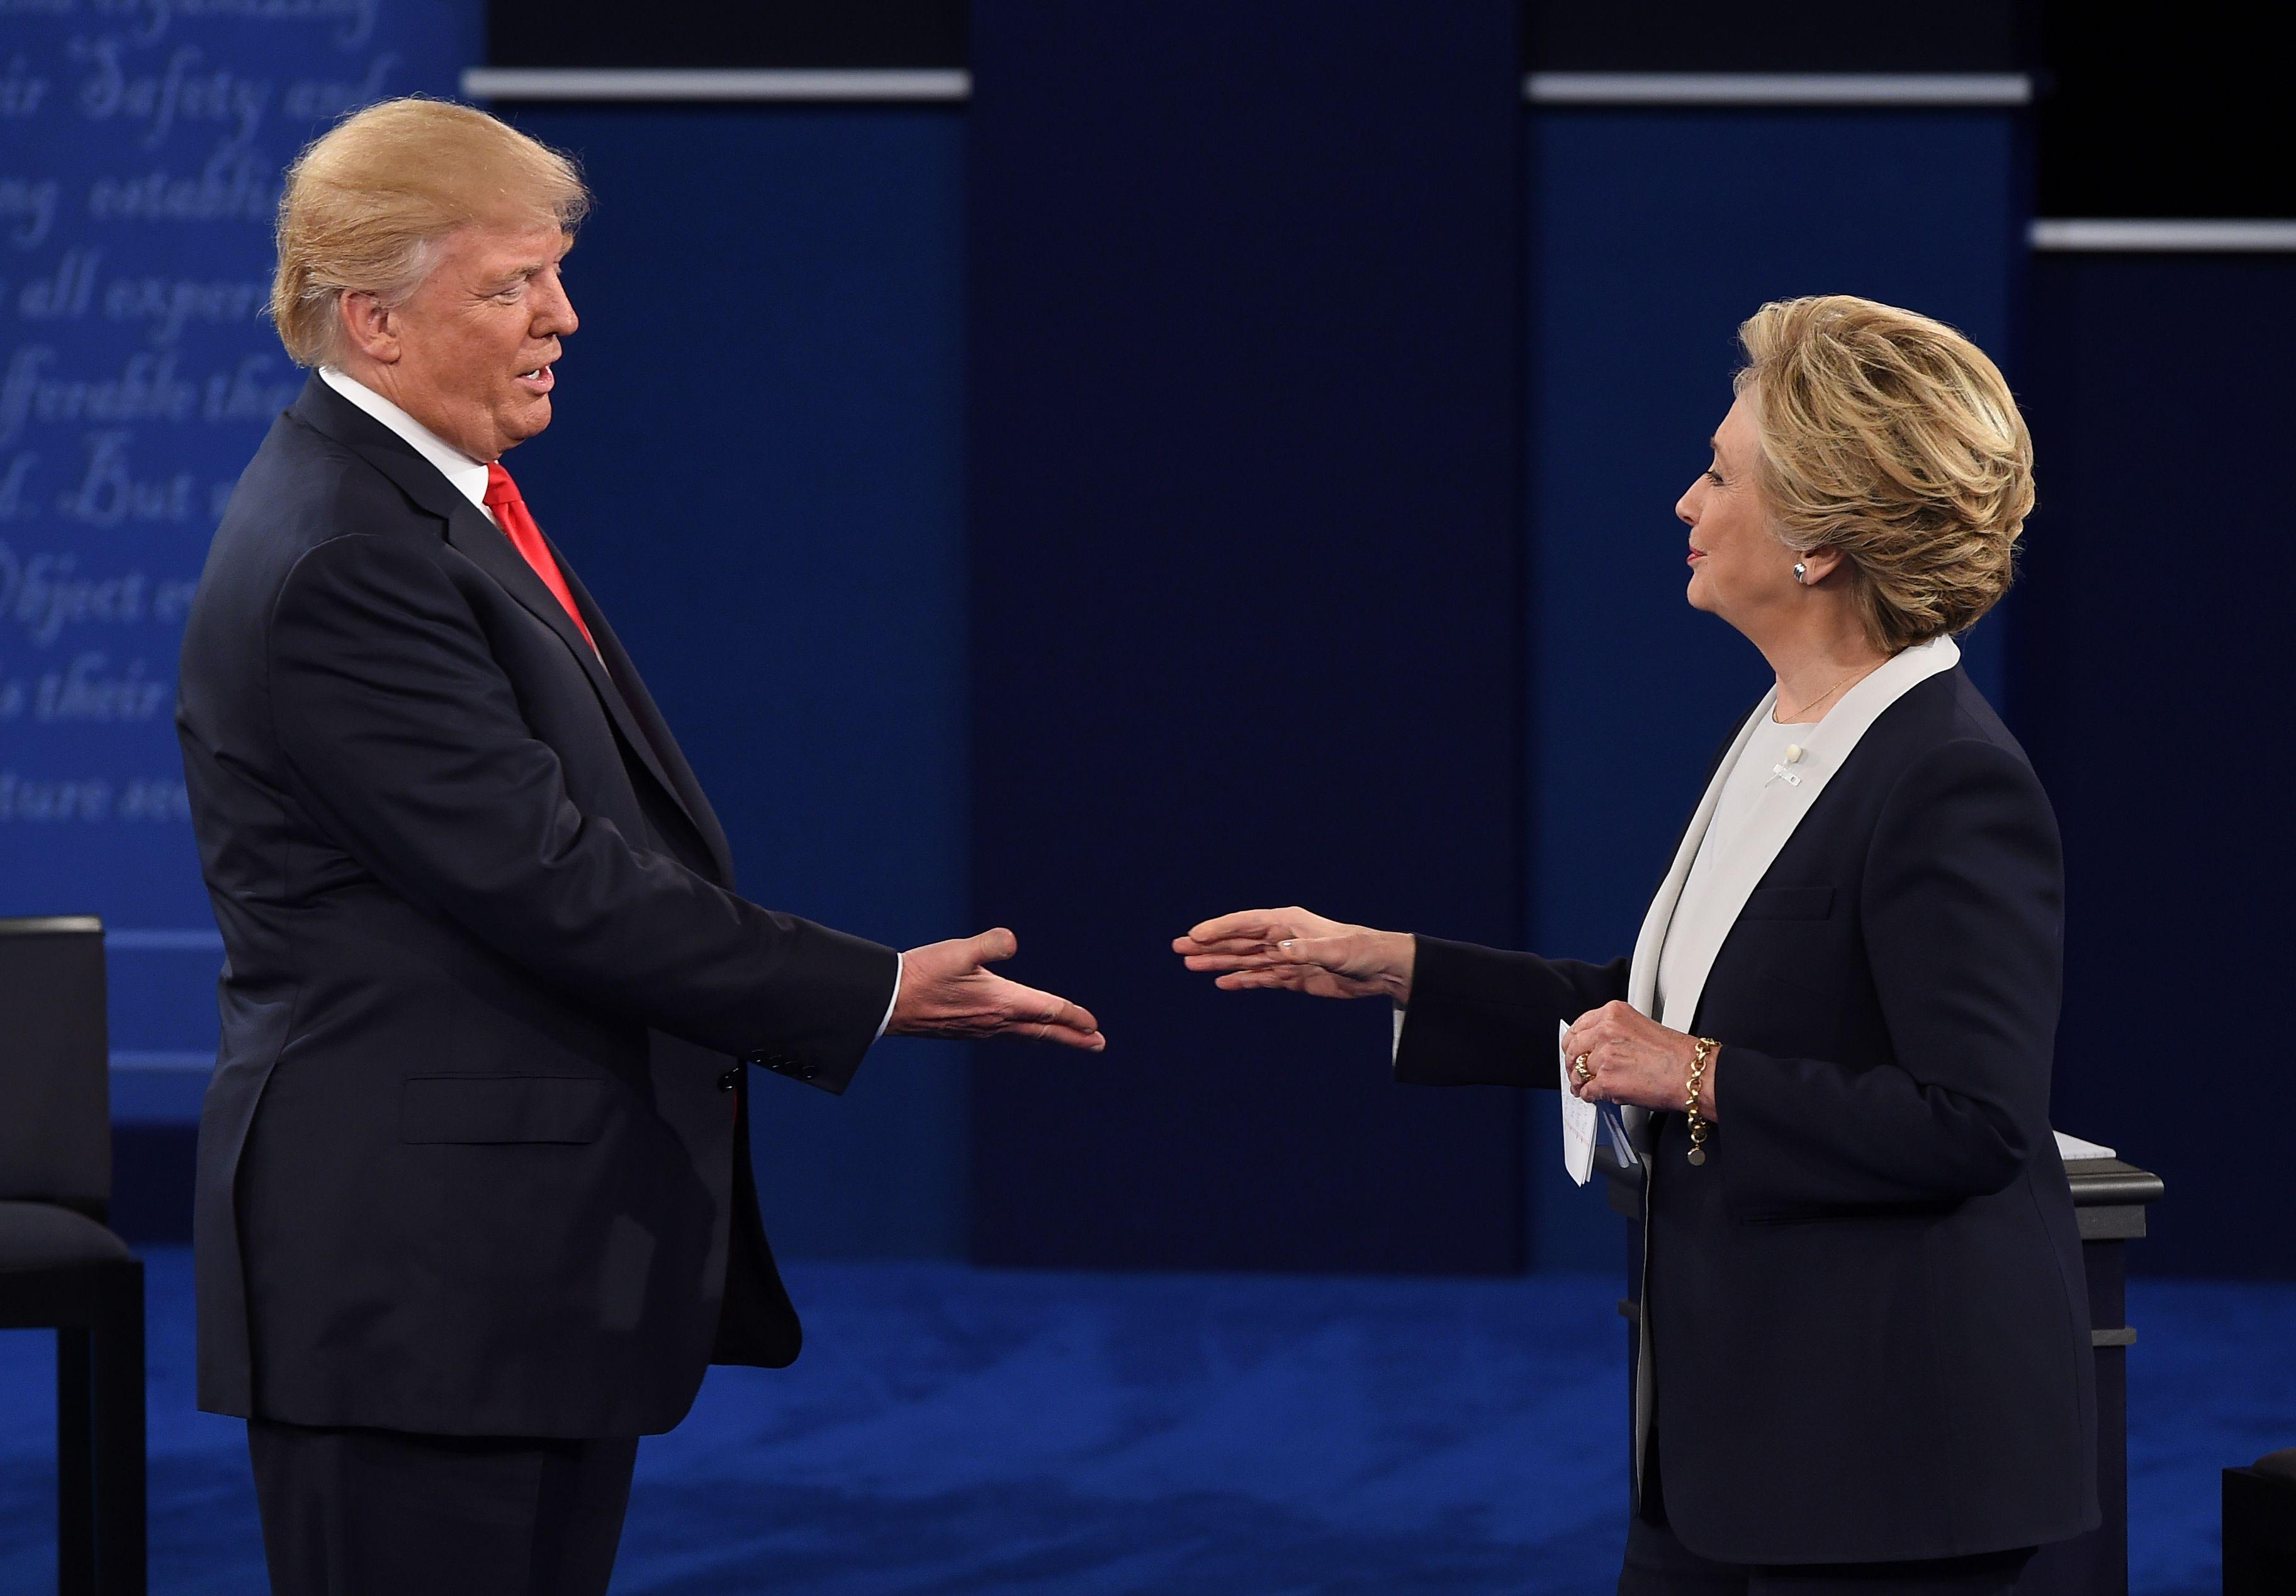 Scarborough, Brzezinski revise history, claim they didn't accommodate Trump